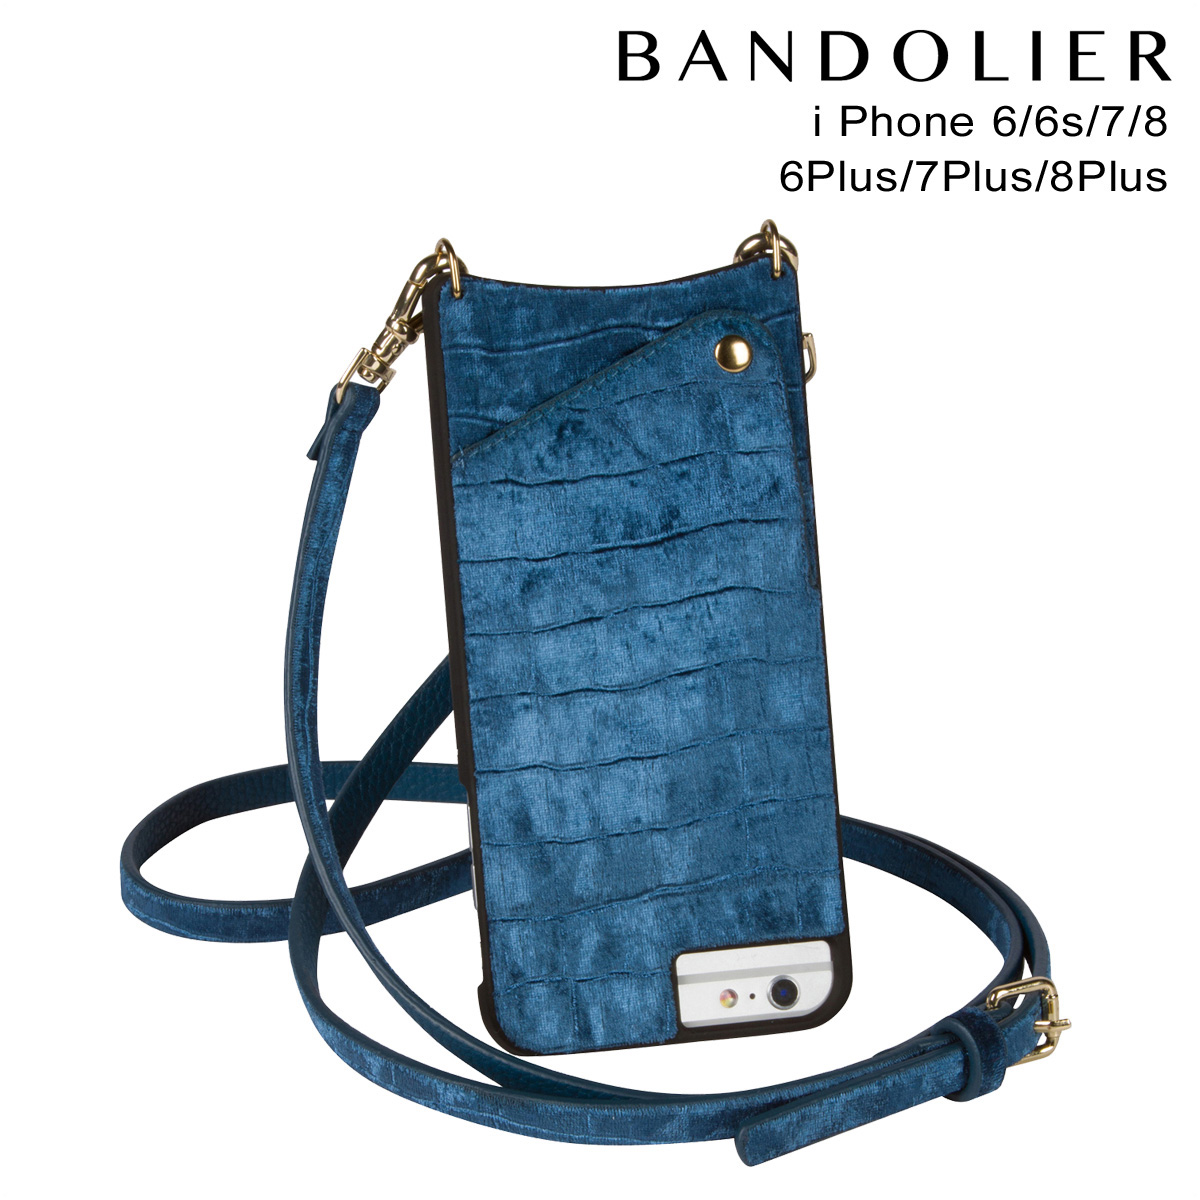 88d1da2d02 BANDOLIER EMMA VELVET バンドリヤー iPhone8 iPhone7 7Plus 送料無料 6s ...